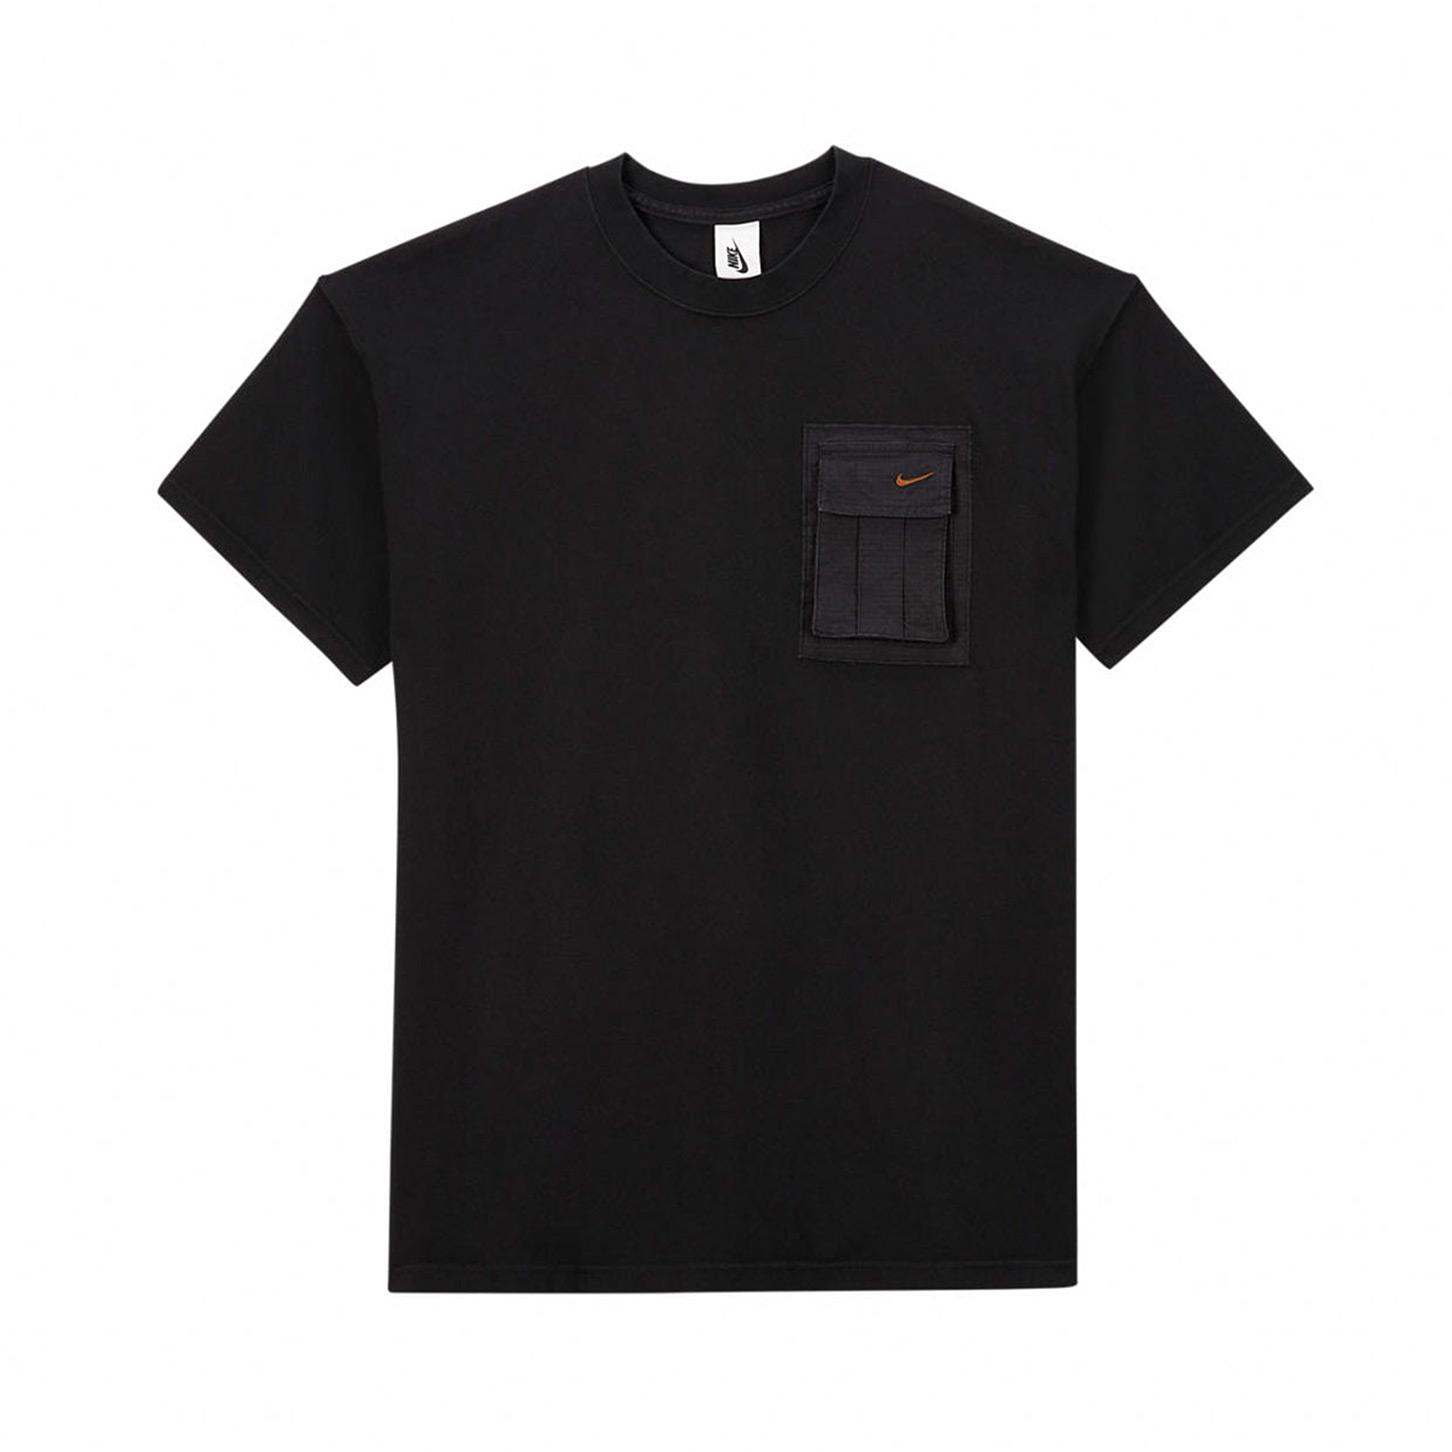 Travis Scott x Nike NRG AG Tee Black